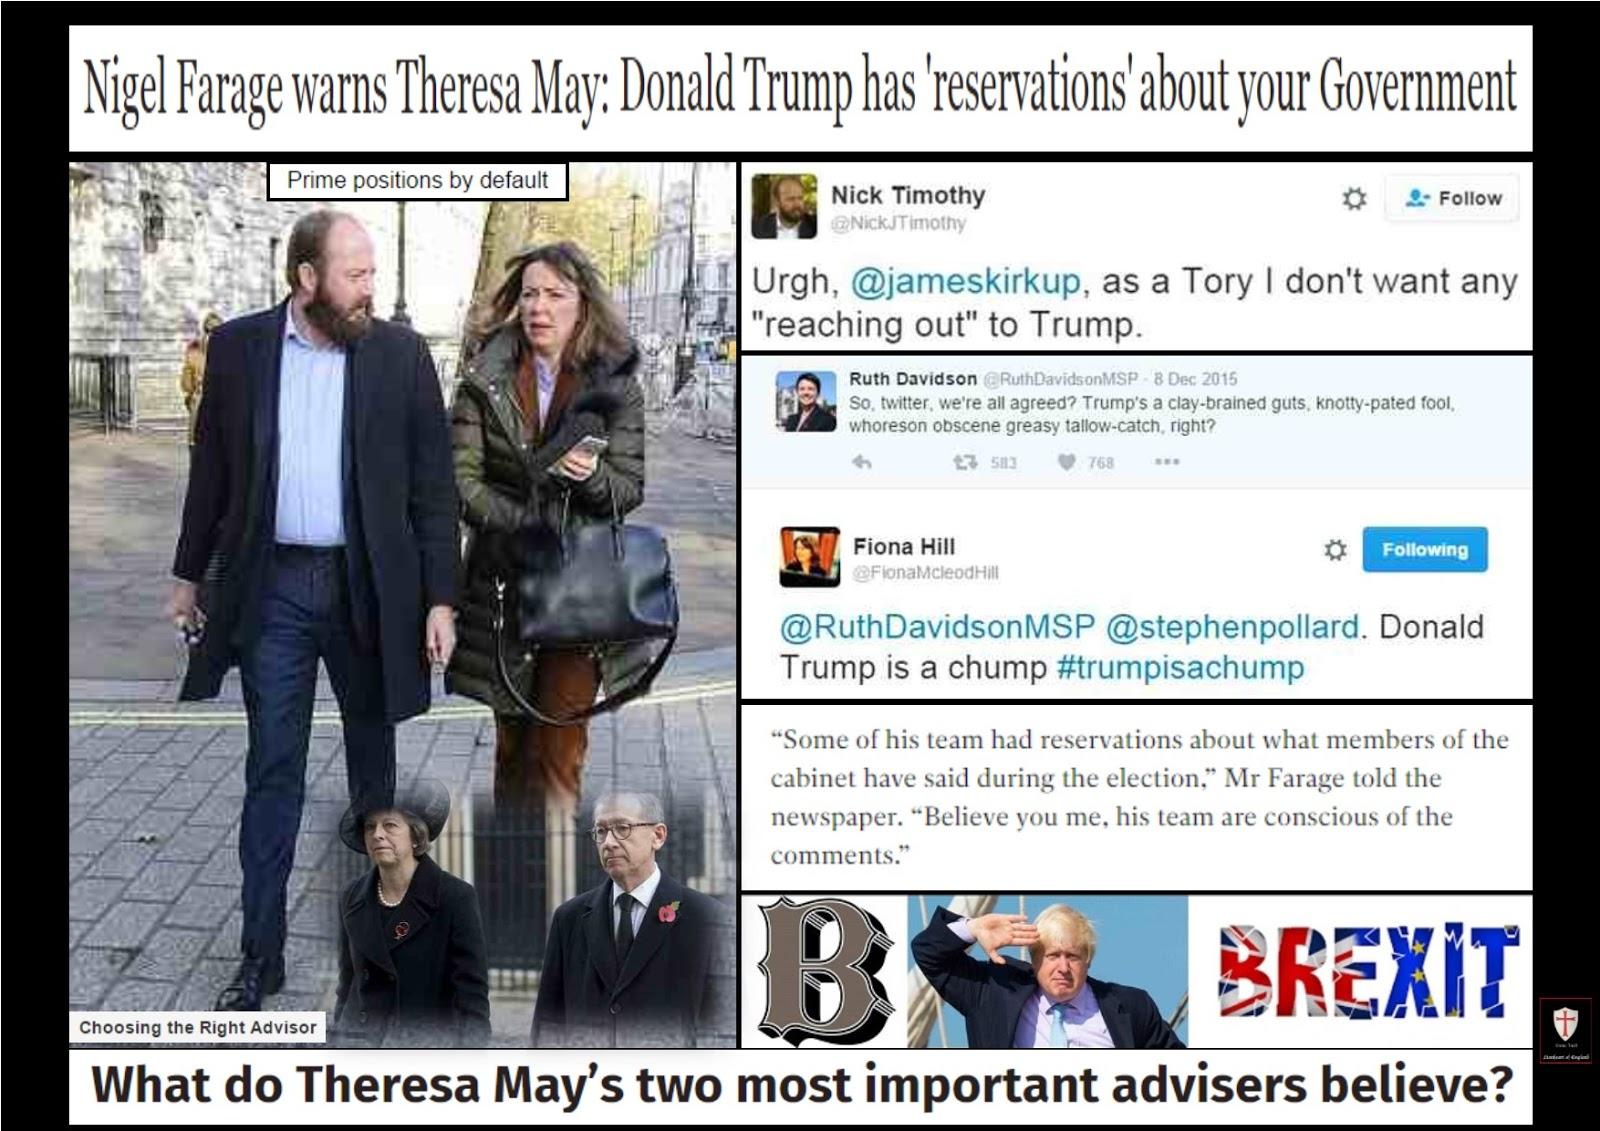 Lionheart: British PM & Her choice of political advisors